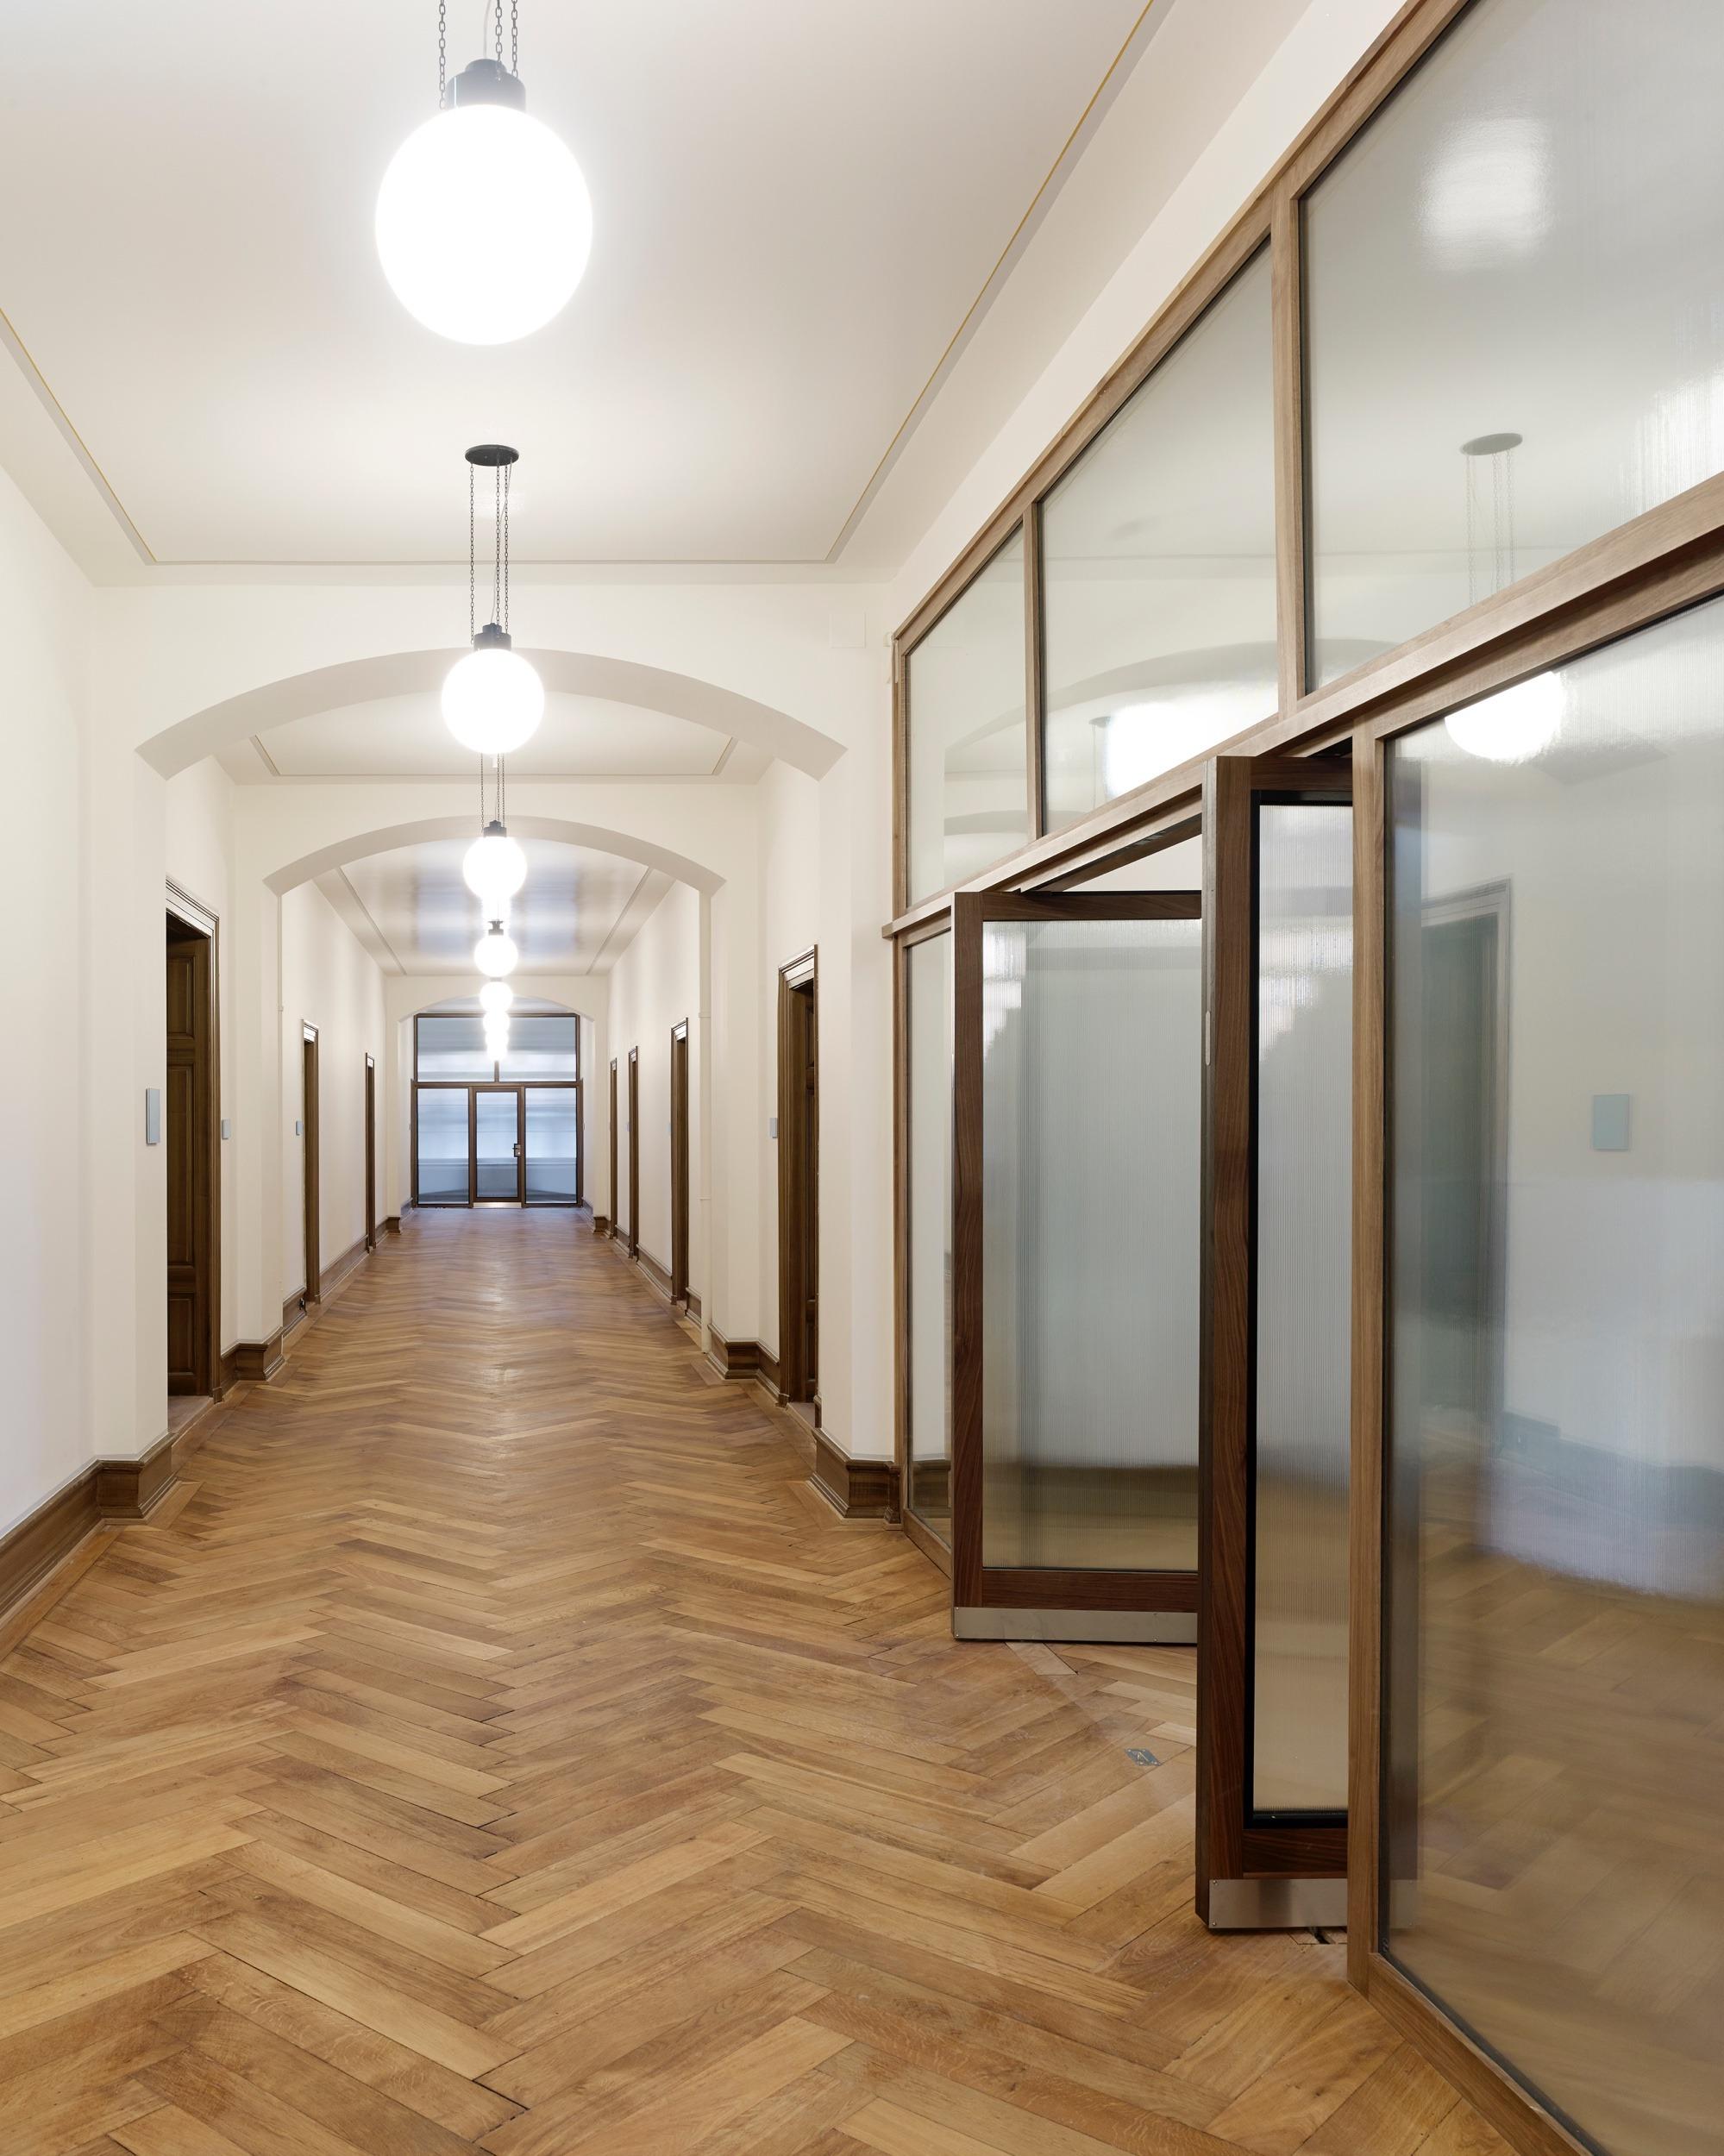 Fenstertuere_Framestar_Regierungsgebaeude_Frauenfeld_002